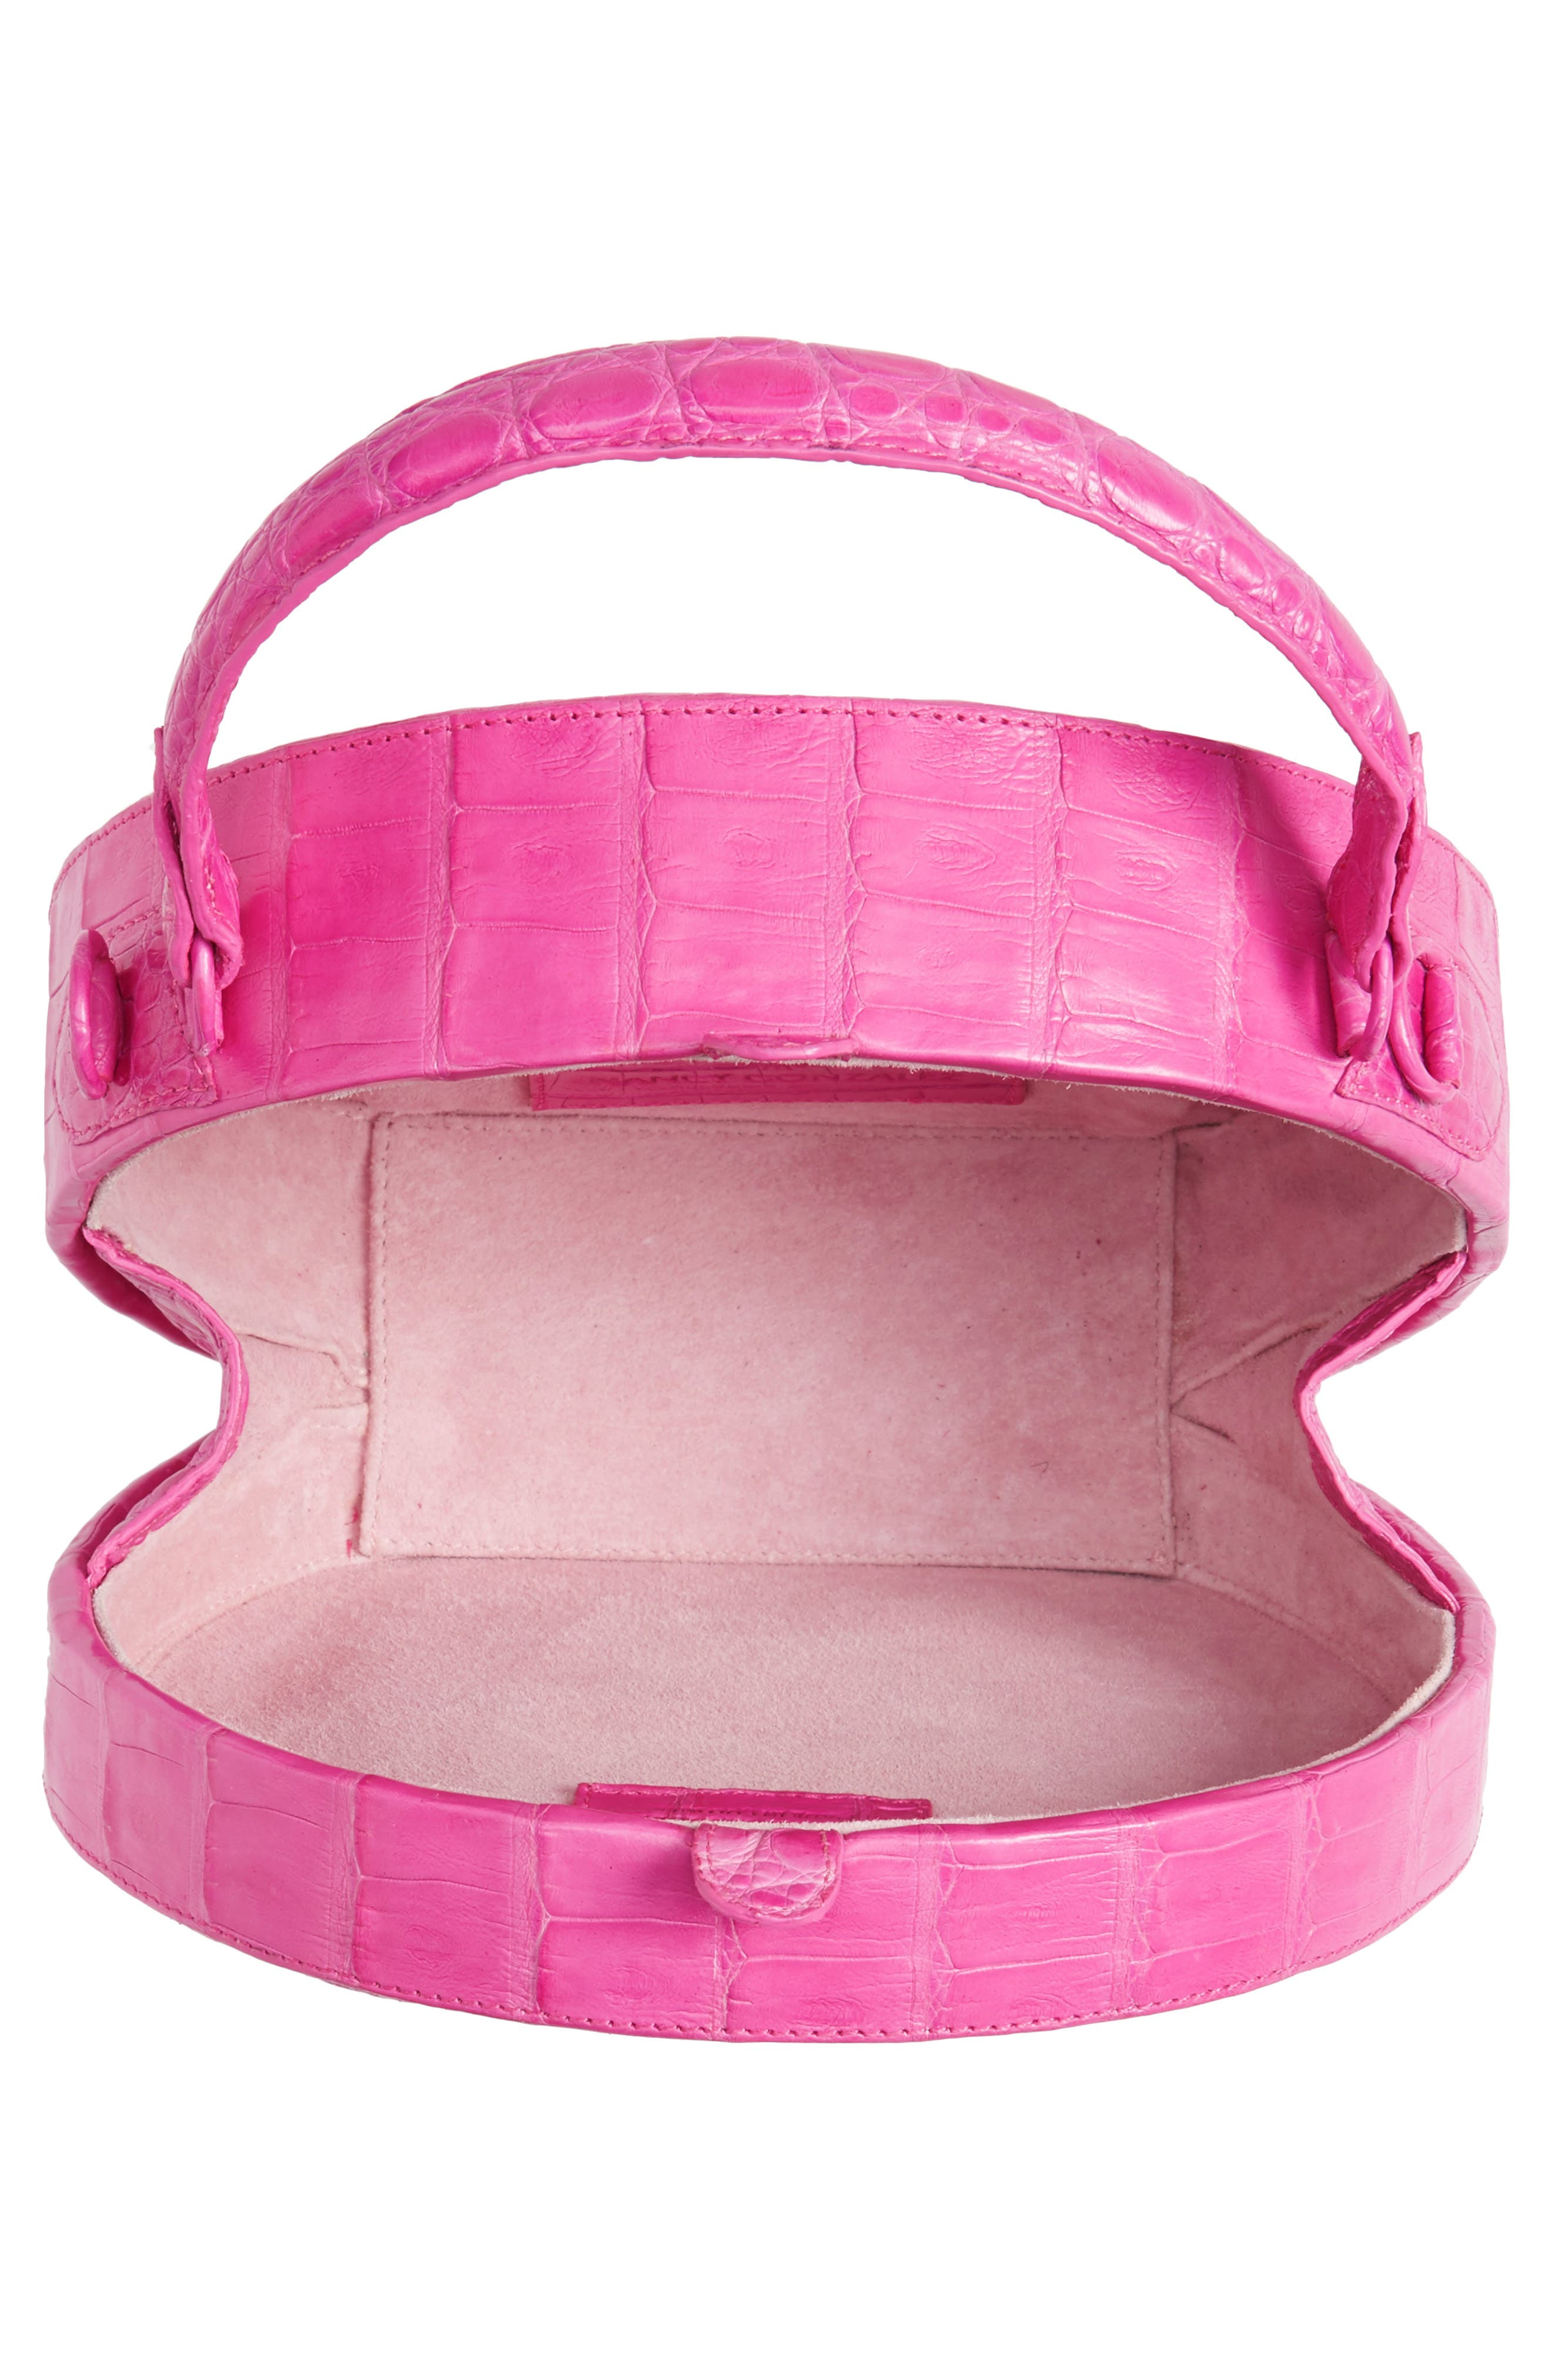 Genuine Crocodile Circle Bag,                             Alternate thumbnail 4, color,                             Pink